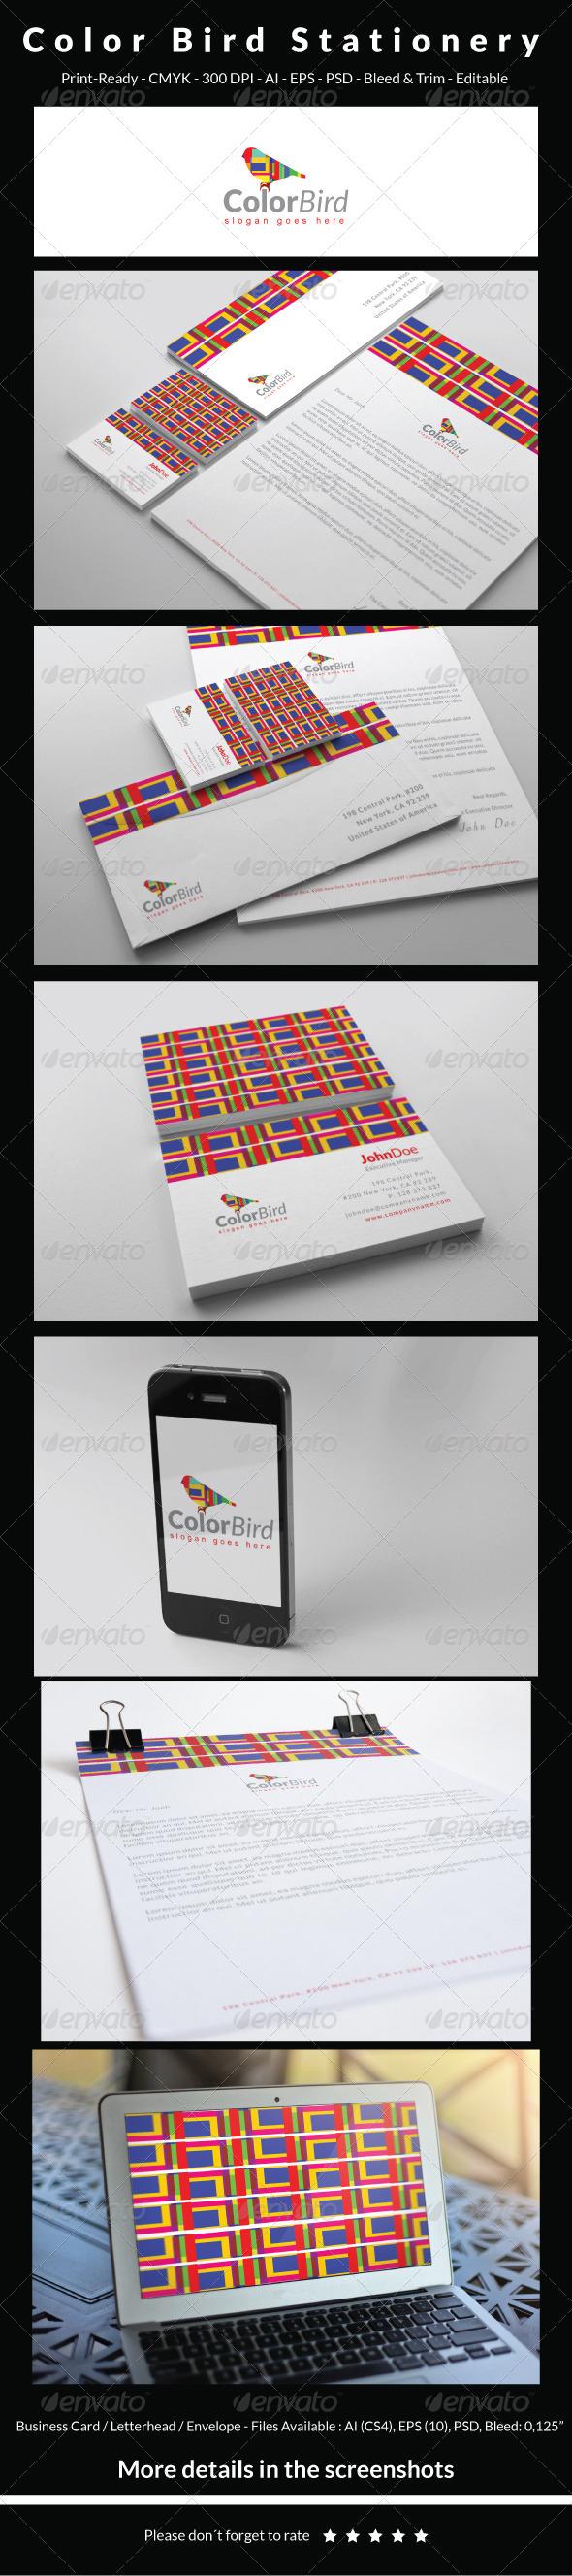 GraphicRiver Color Bird Stationery 6445686